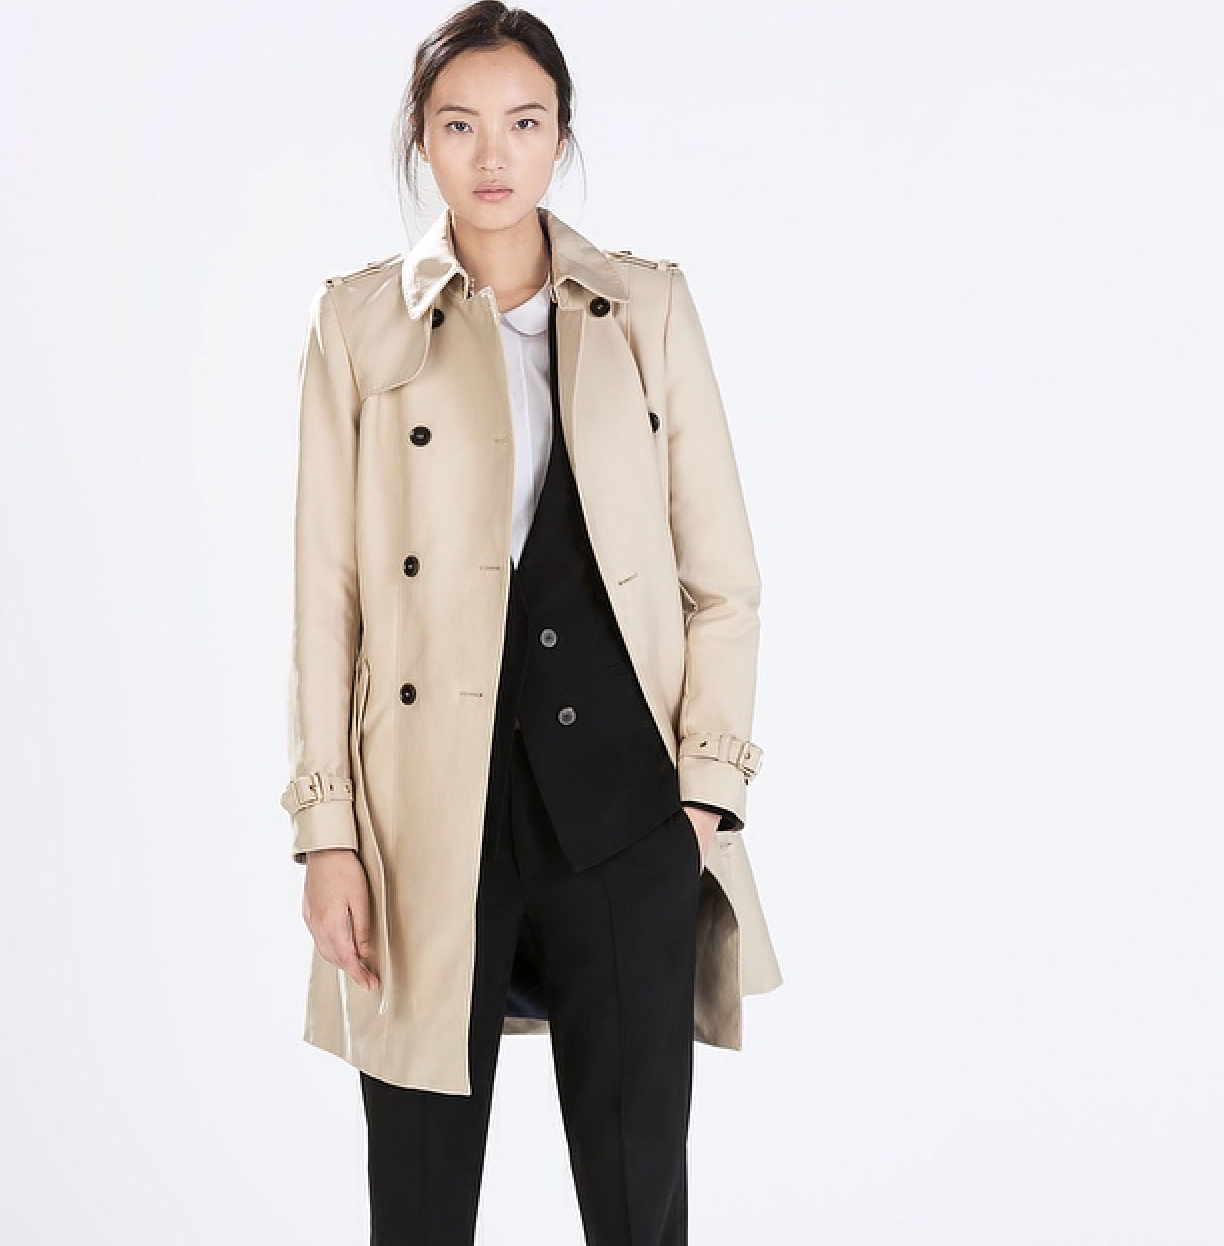 zara trench coat women tradingbasis